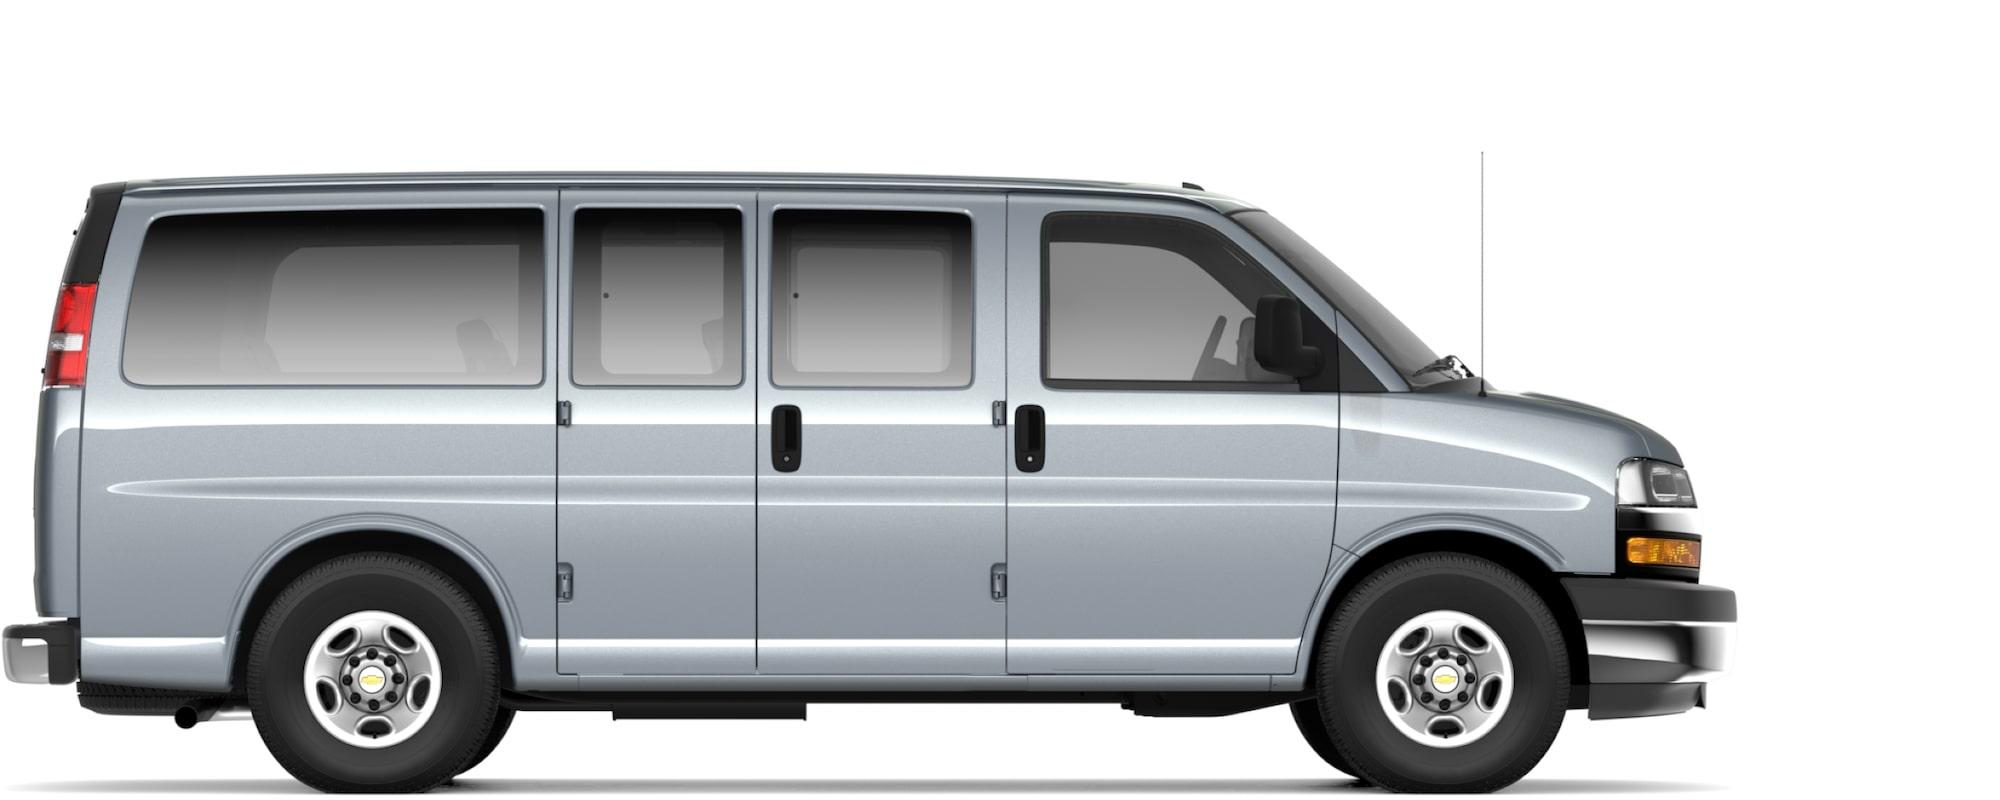 Chevy express 15 passenger van dimensions